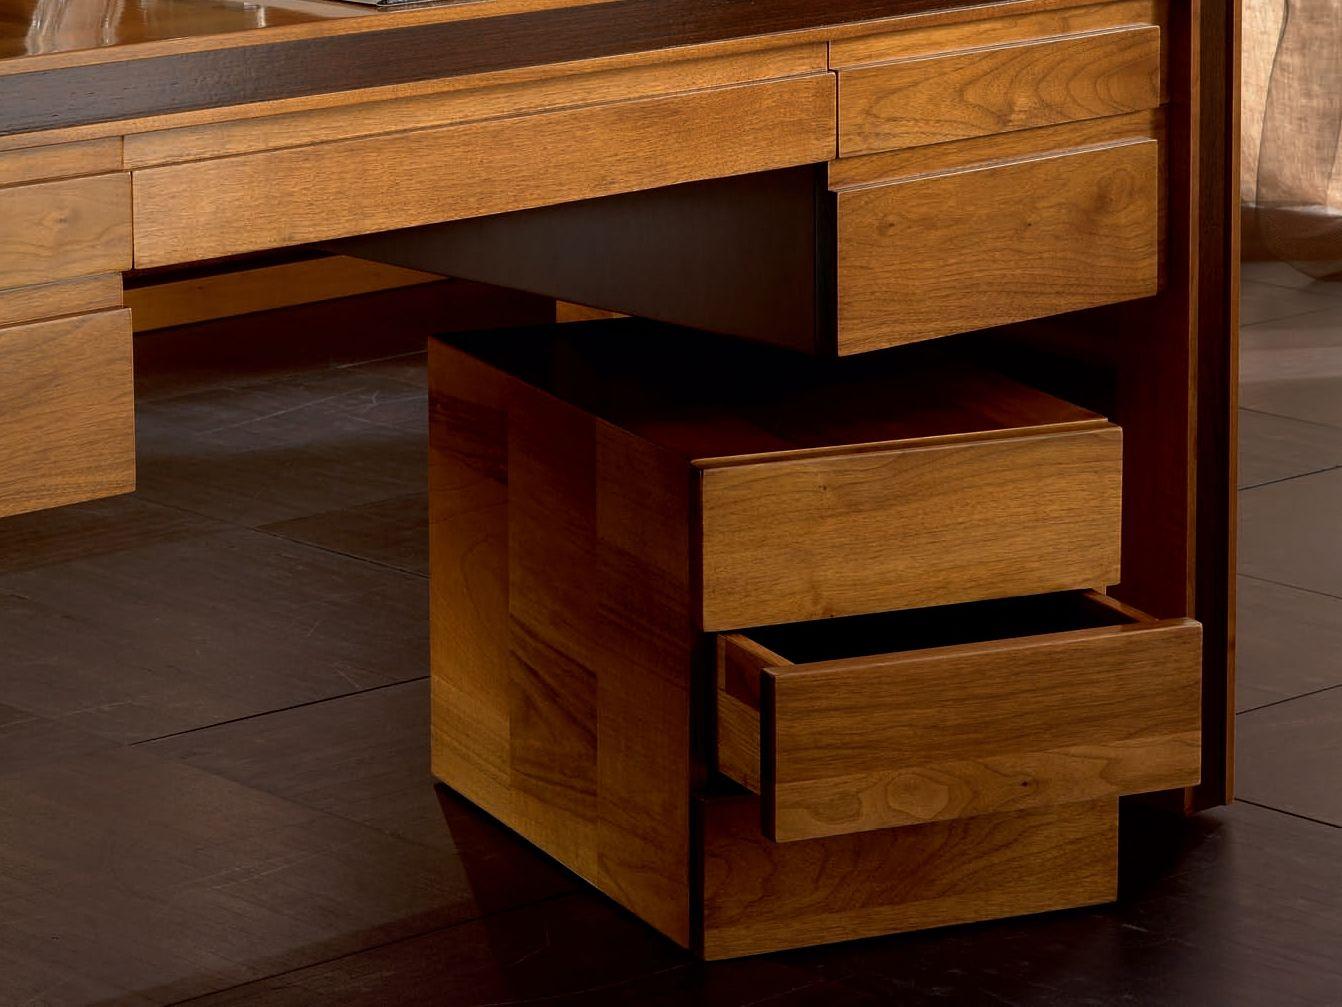 Caisson tiroirs en bois massif roulettes collection elettra day by cantiero - Caisson en bois ...